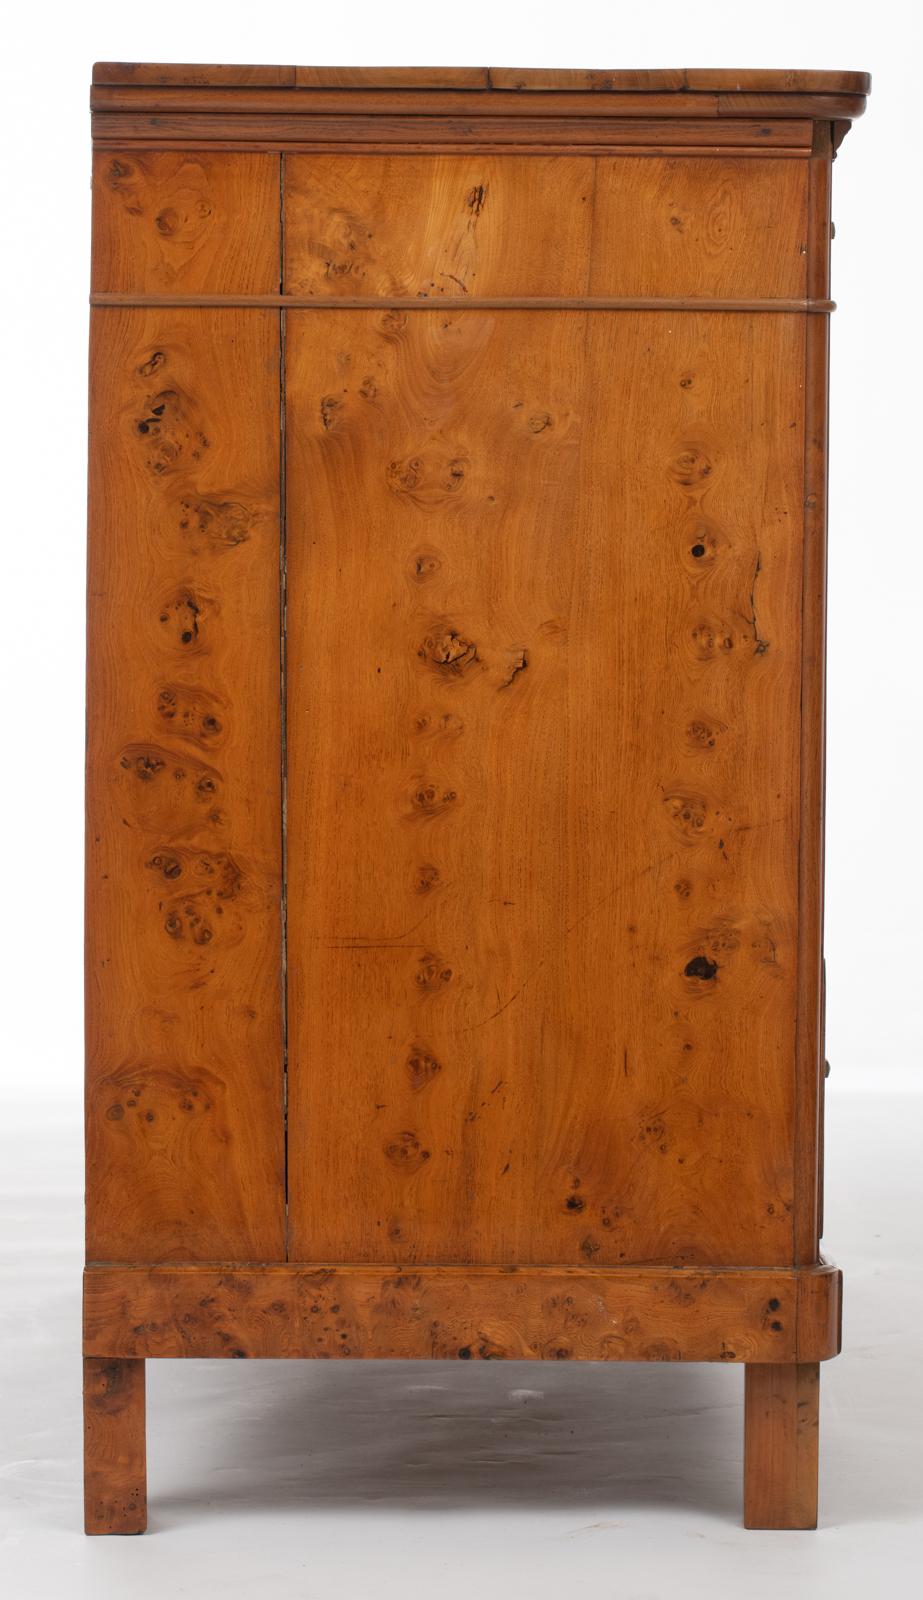 Lot 1071 - A Biedermeier burl cherry and cherry wood chest of drawers, H 96 - W 120 - D 50,5 cm